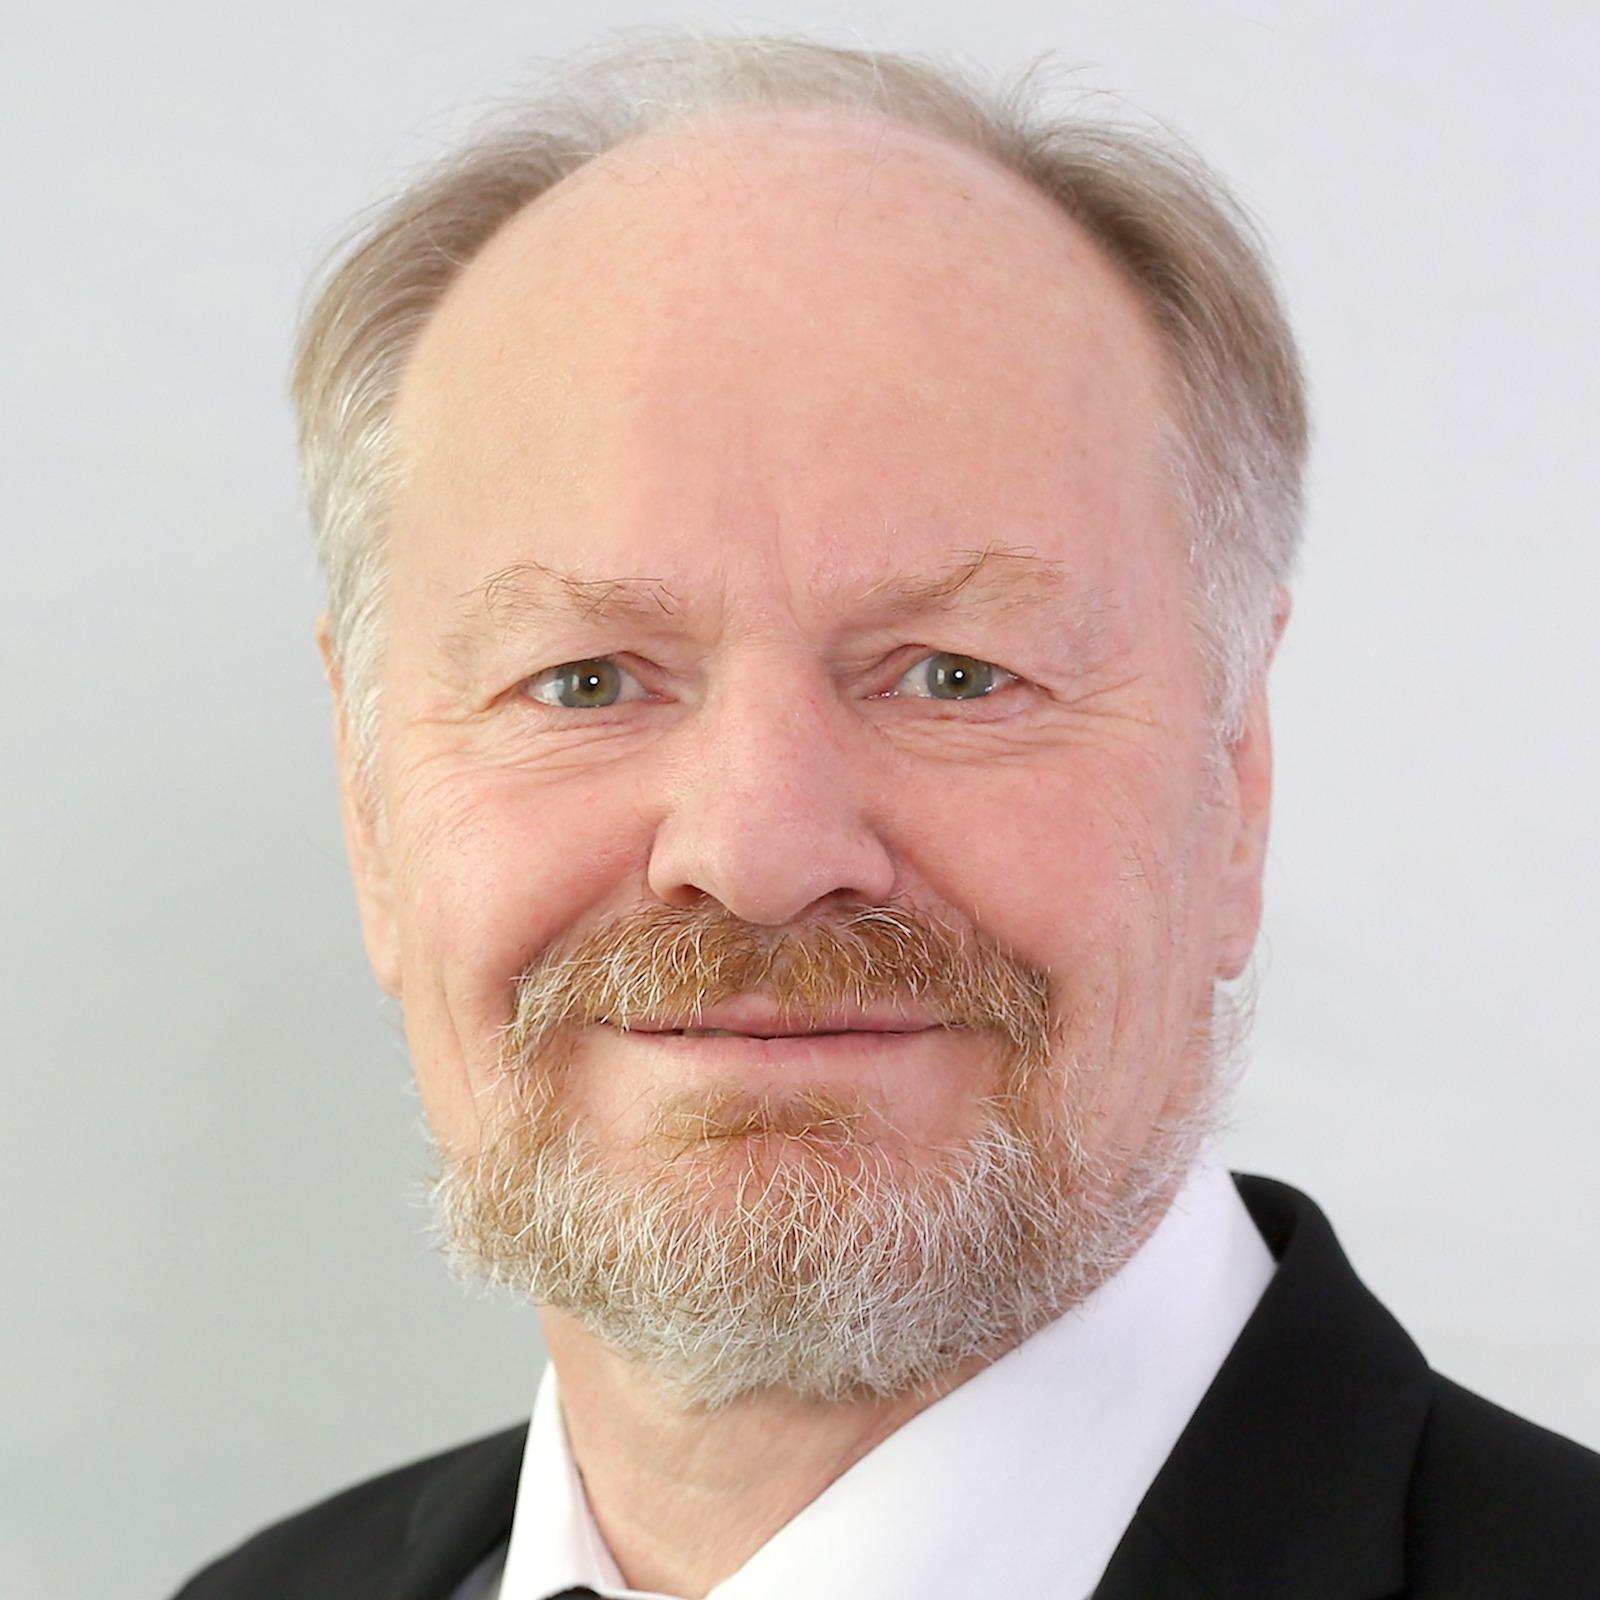 Wulf-Dietrich Leber